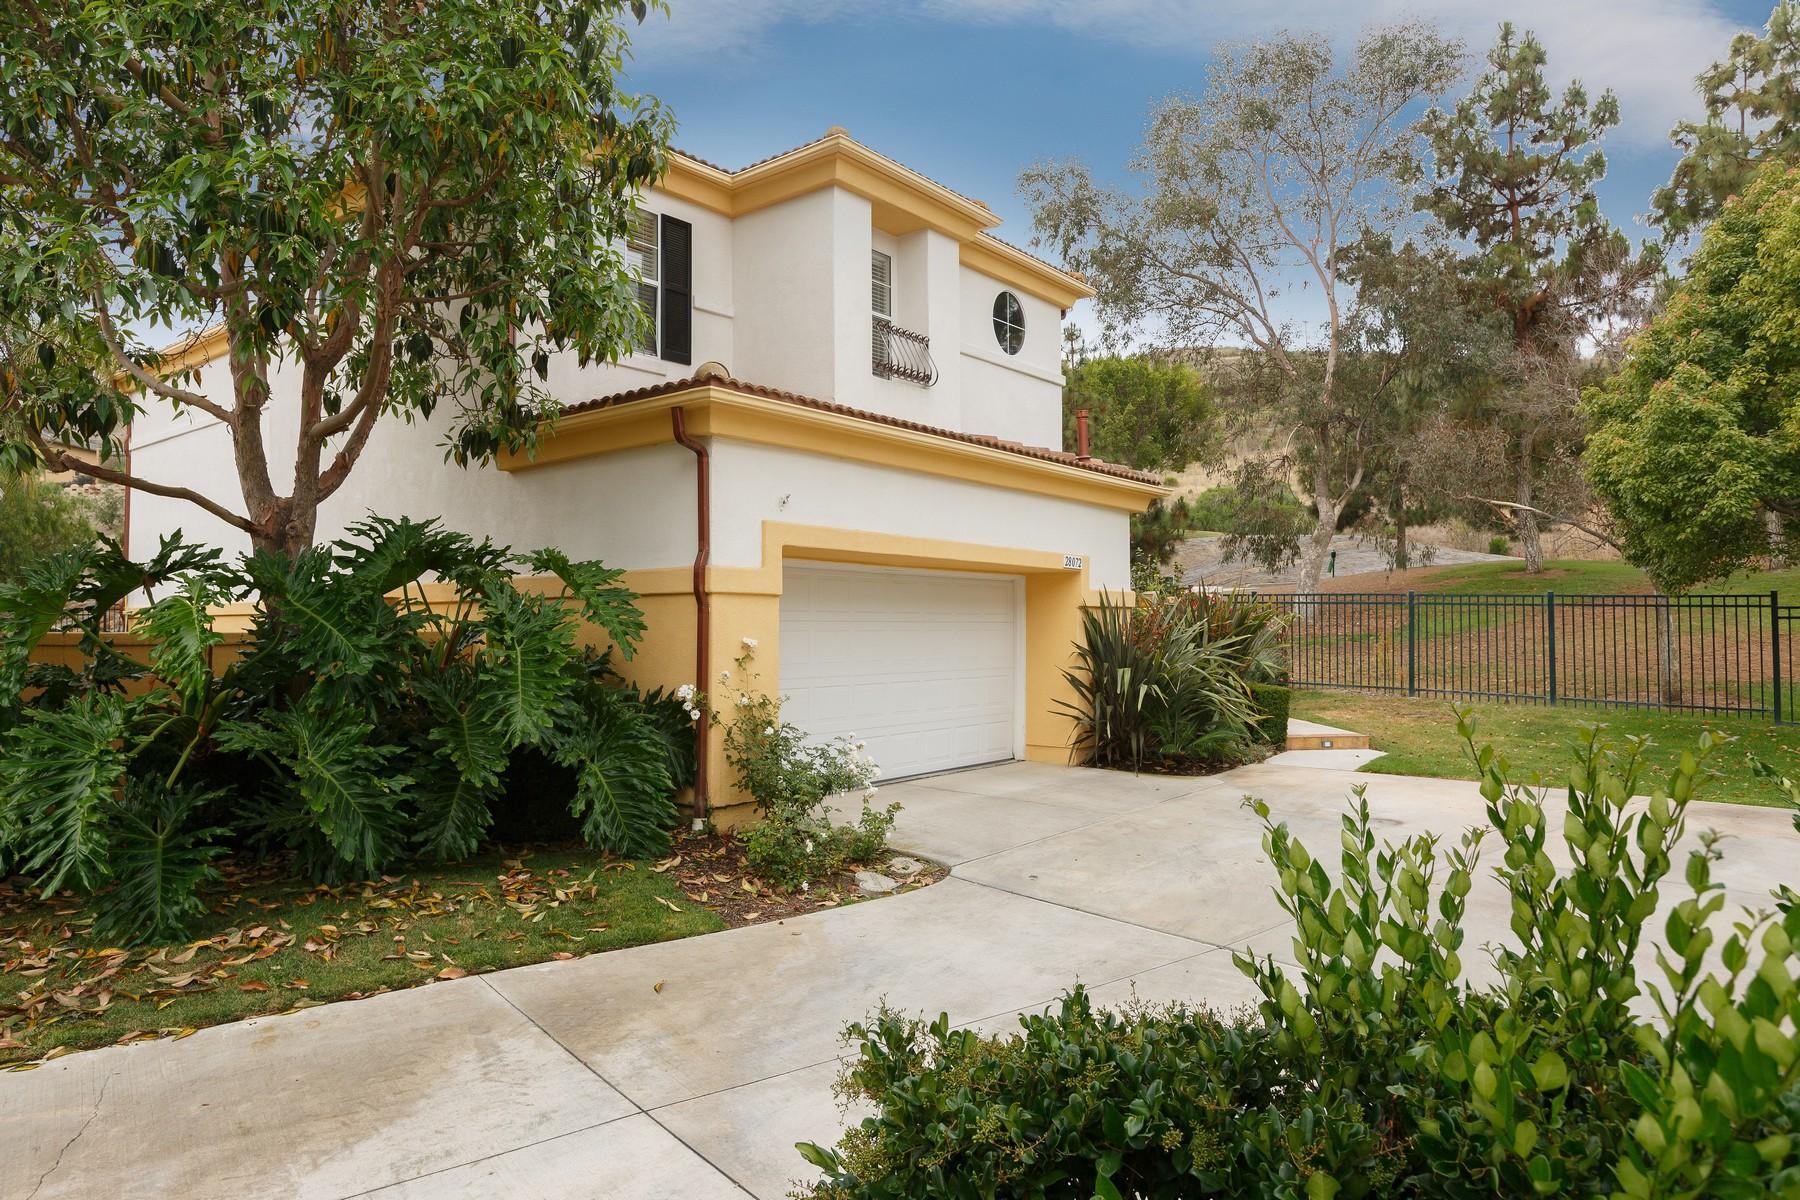 Single Family Home for Sale at 28072 Paseo Hacienda San Juan Capistrano, California 92675 United States